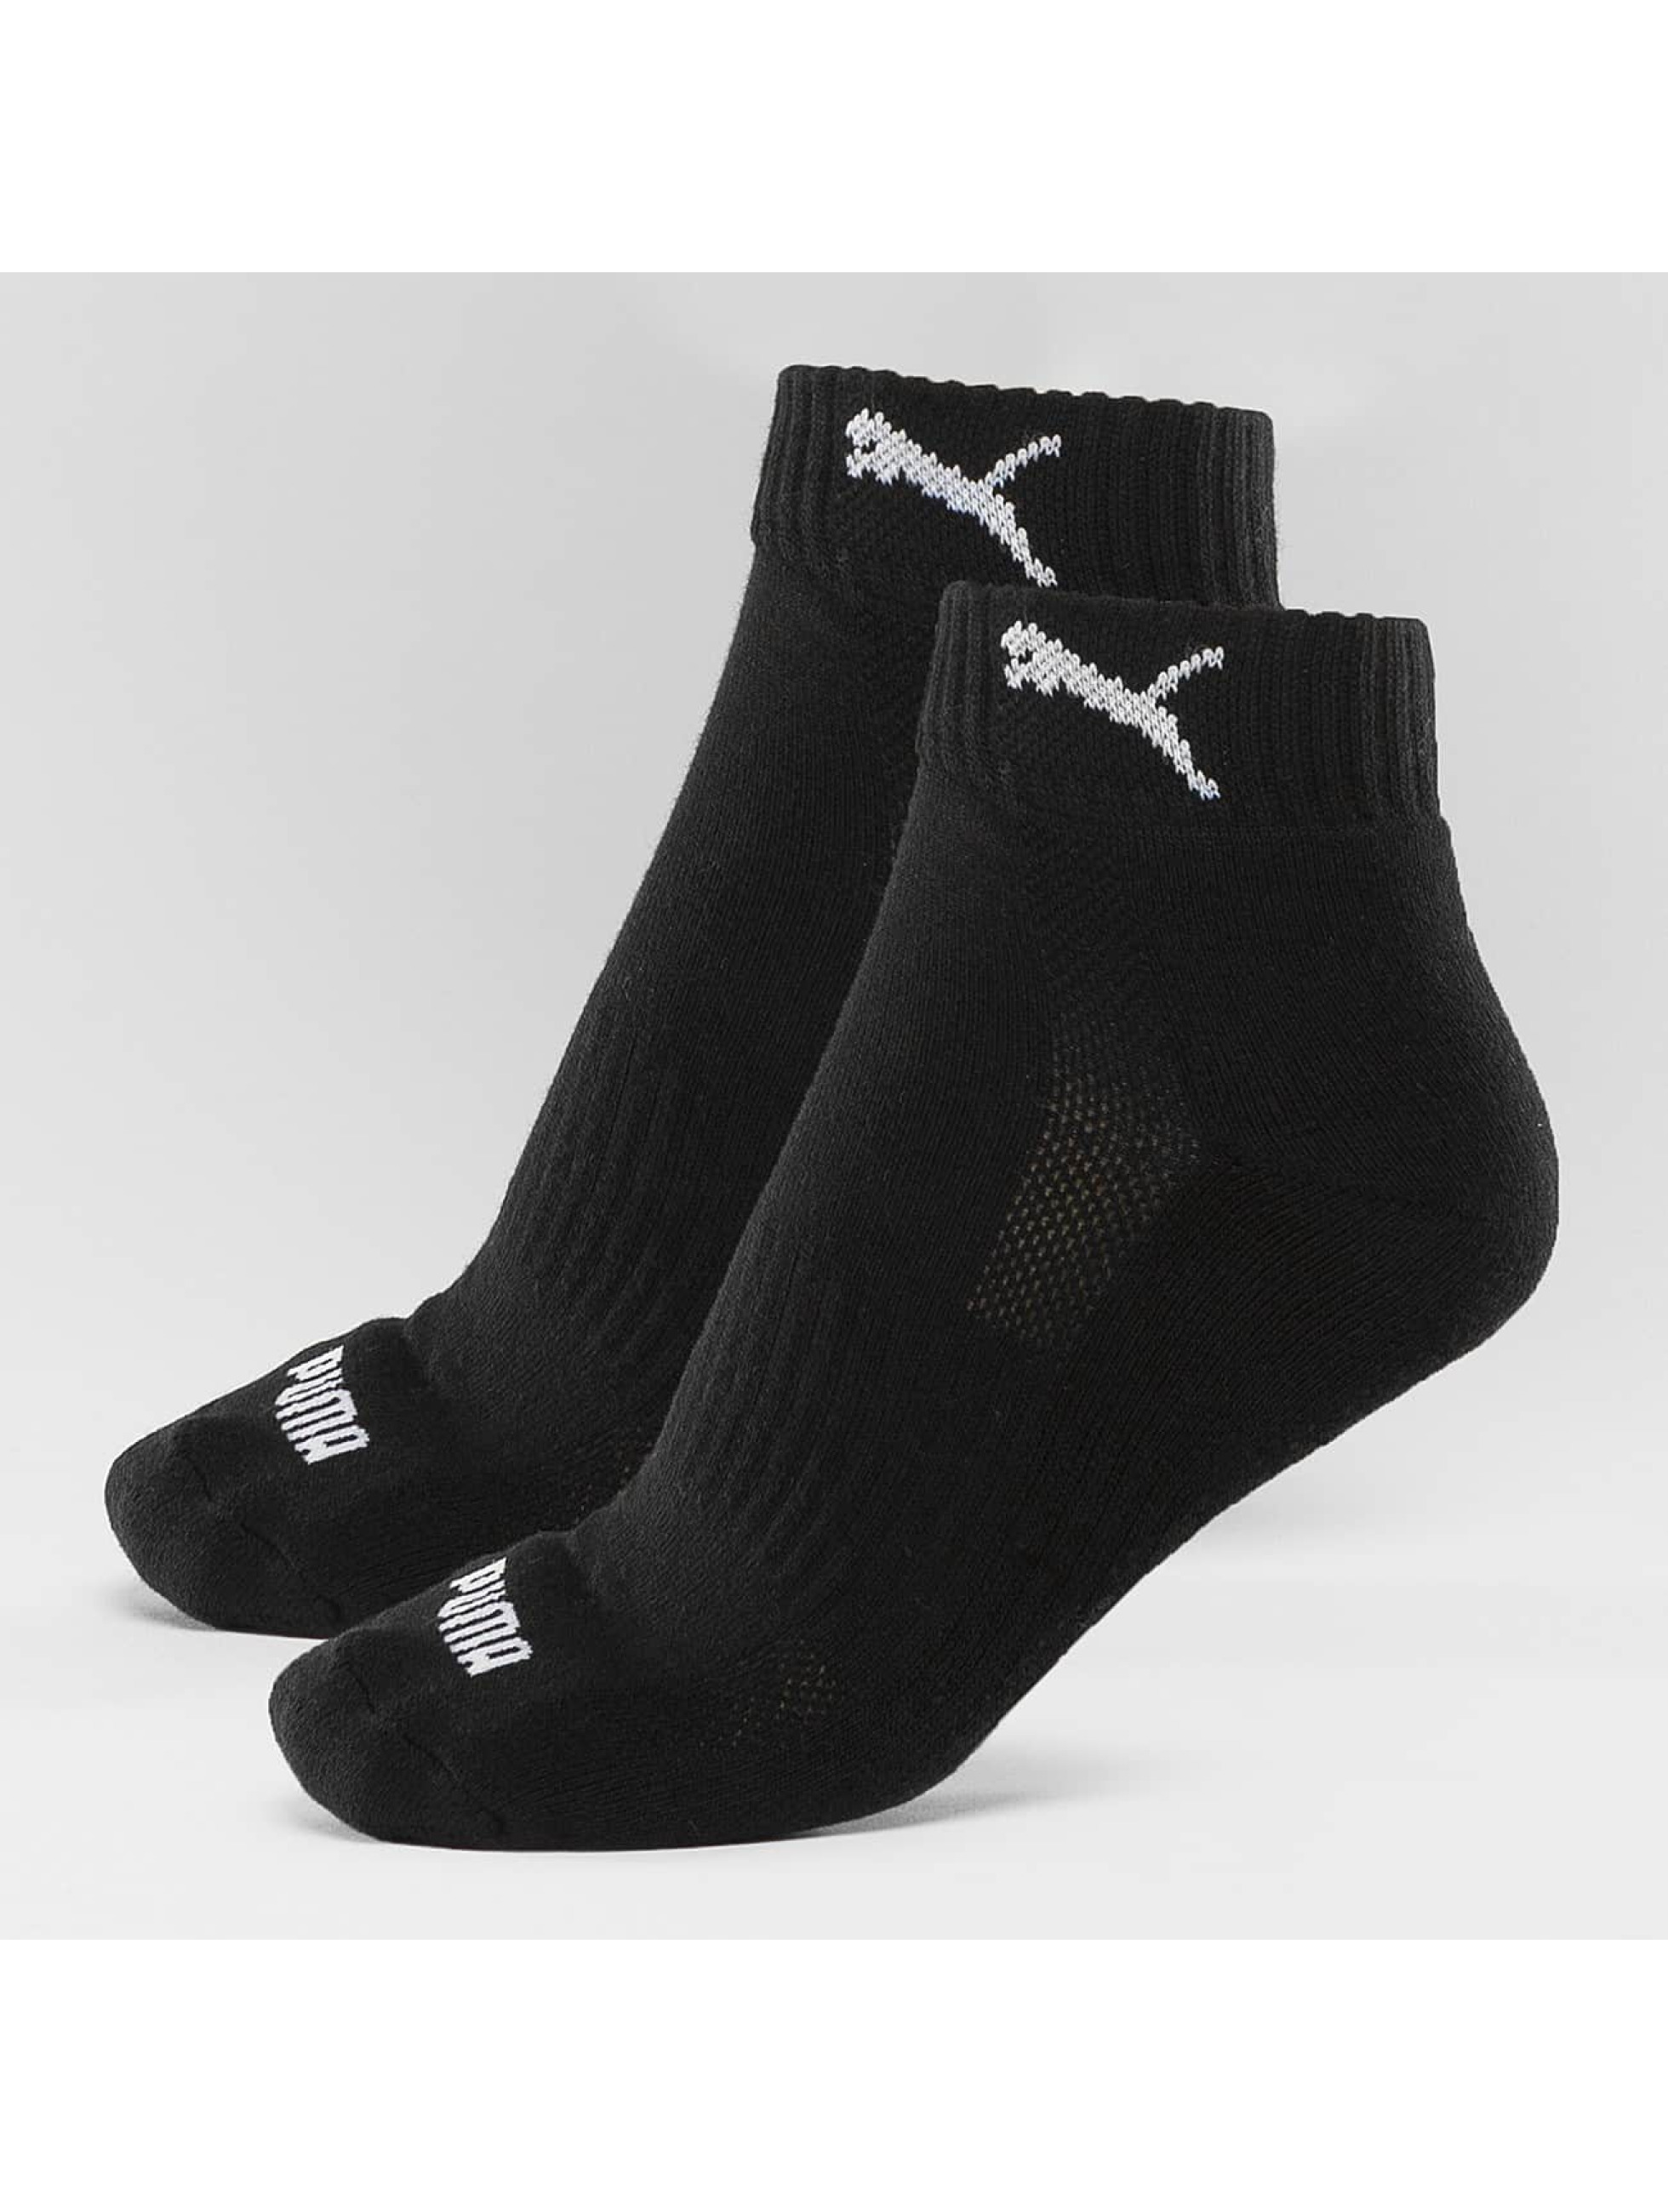 Puma Männer,Frauen Socken 2-Pack Cushioned Quarters in schwarz